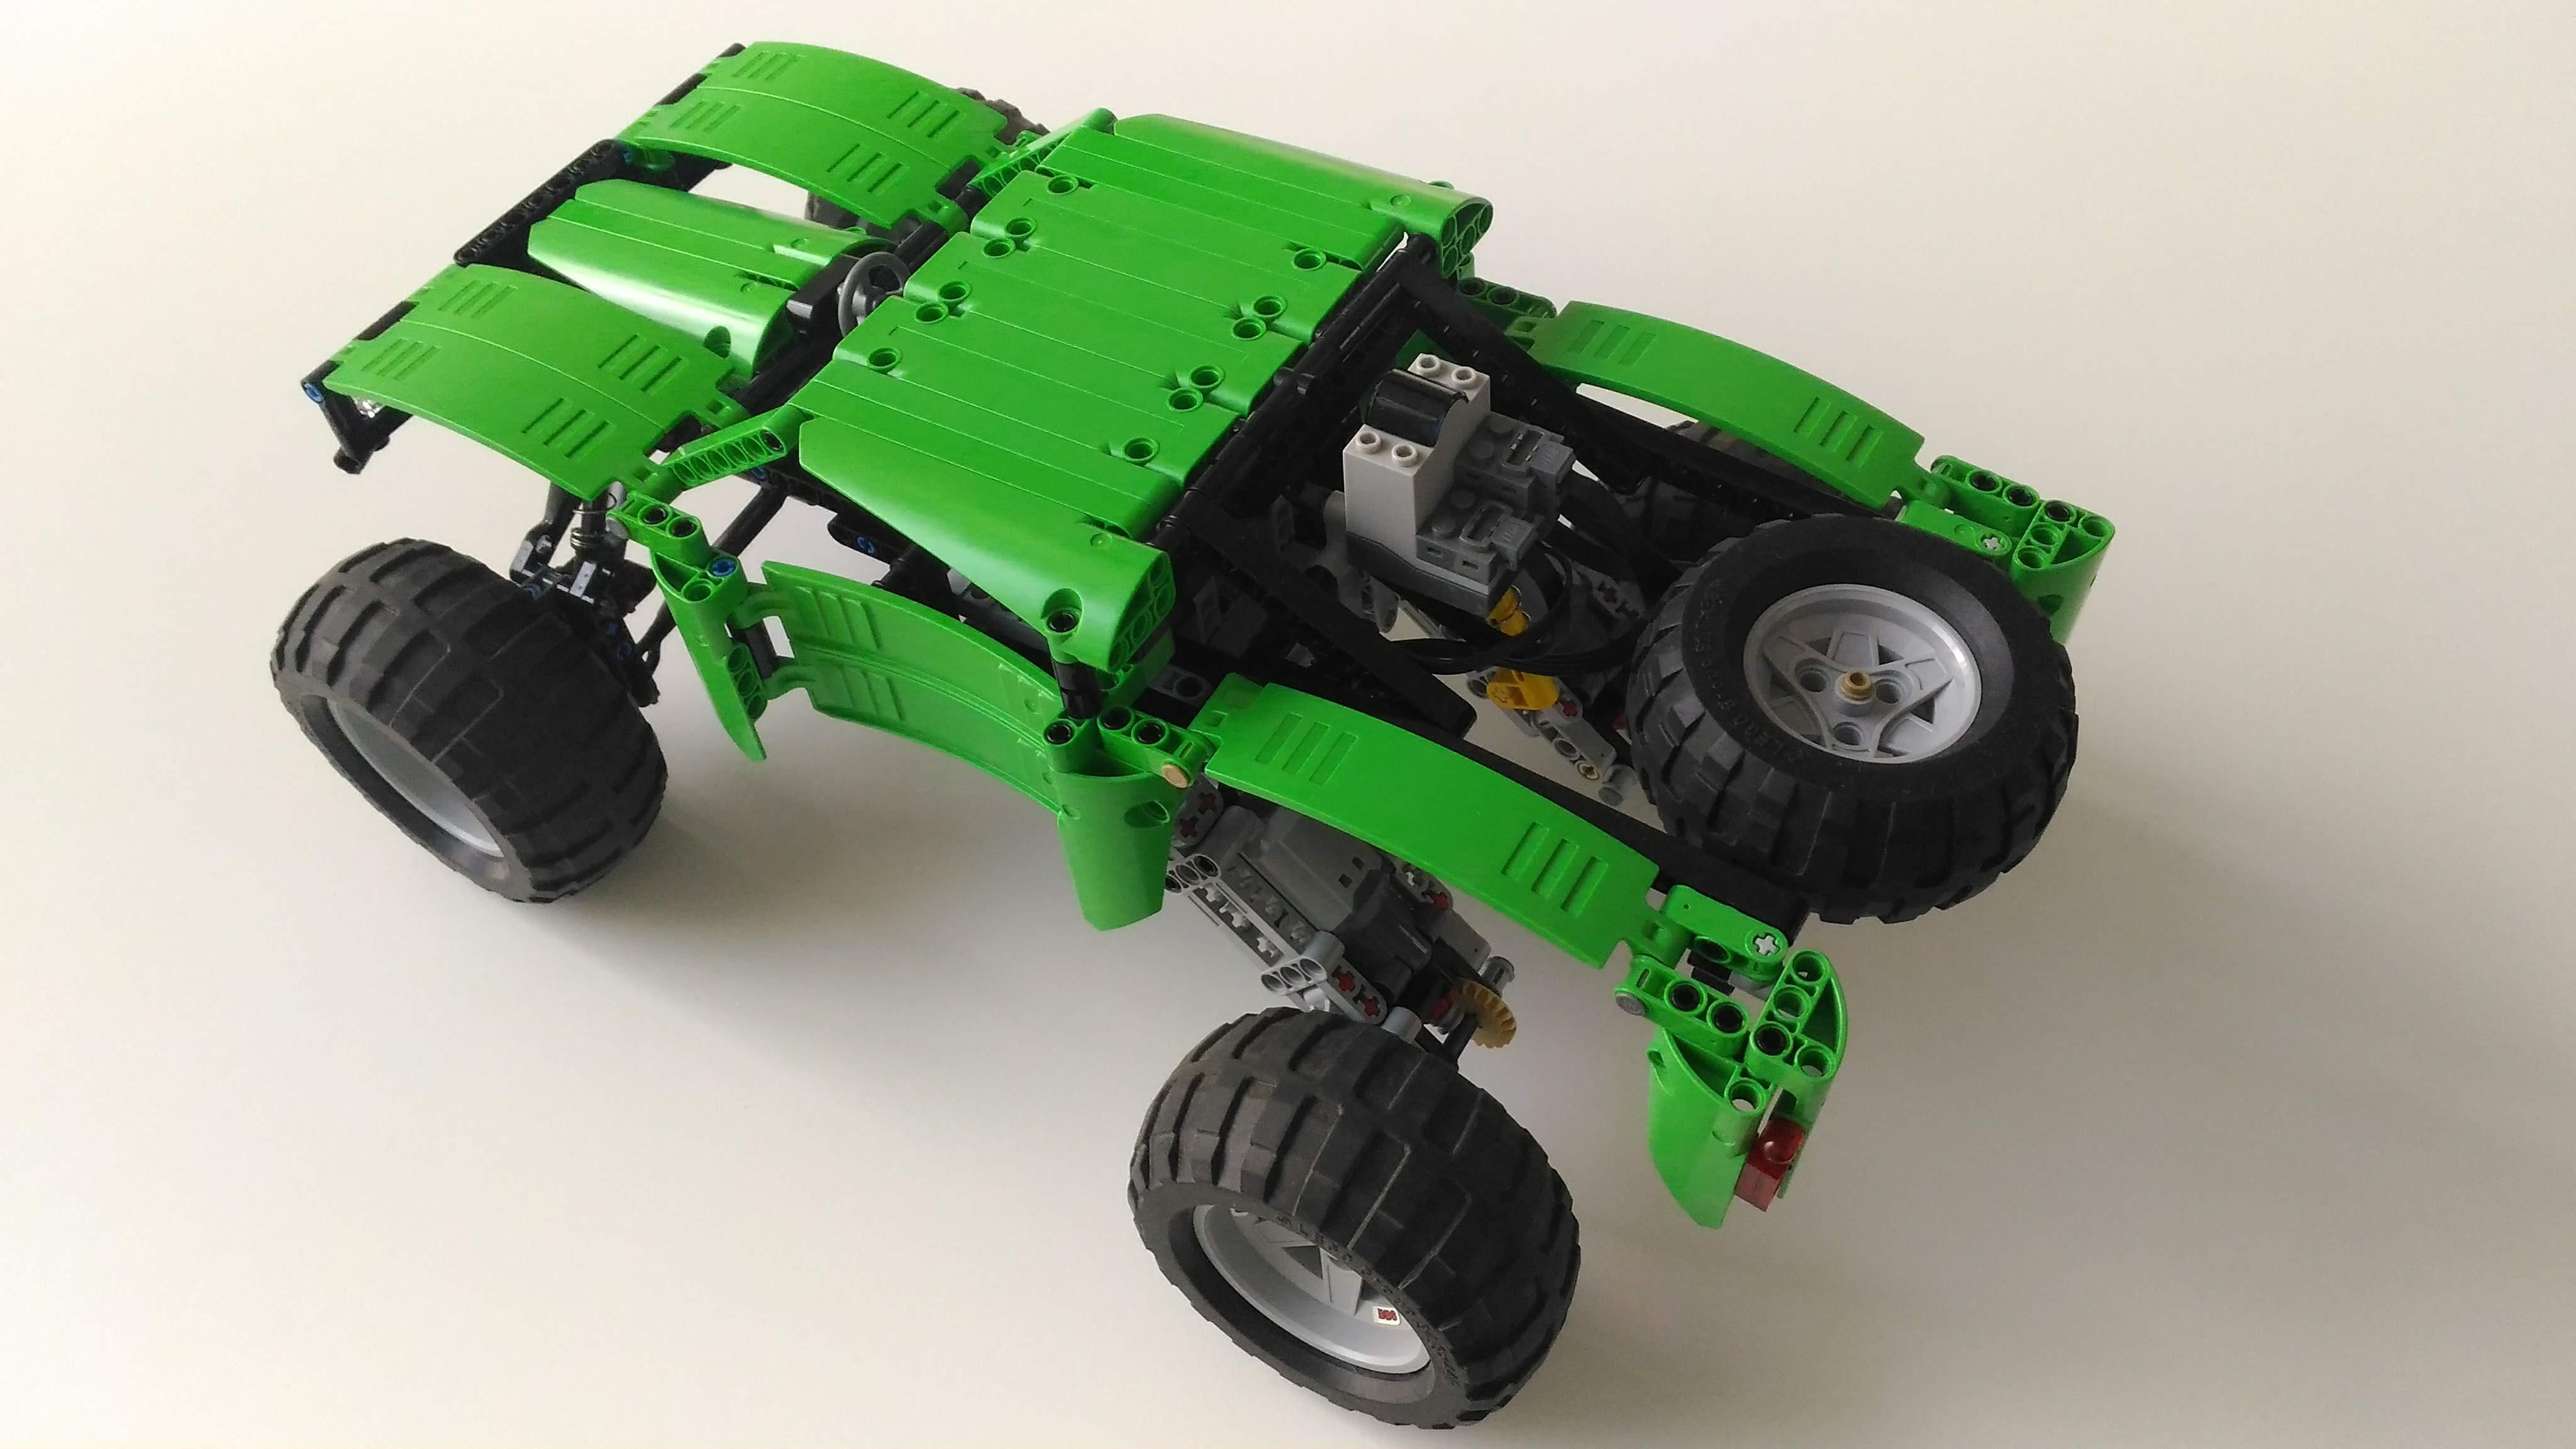 Yeti (Axial Racing) by braker23